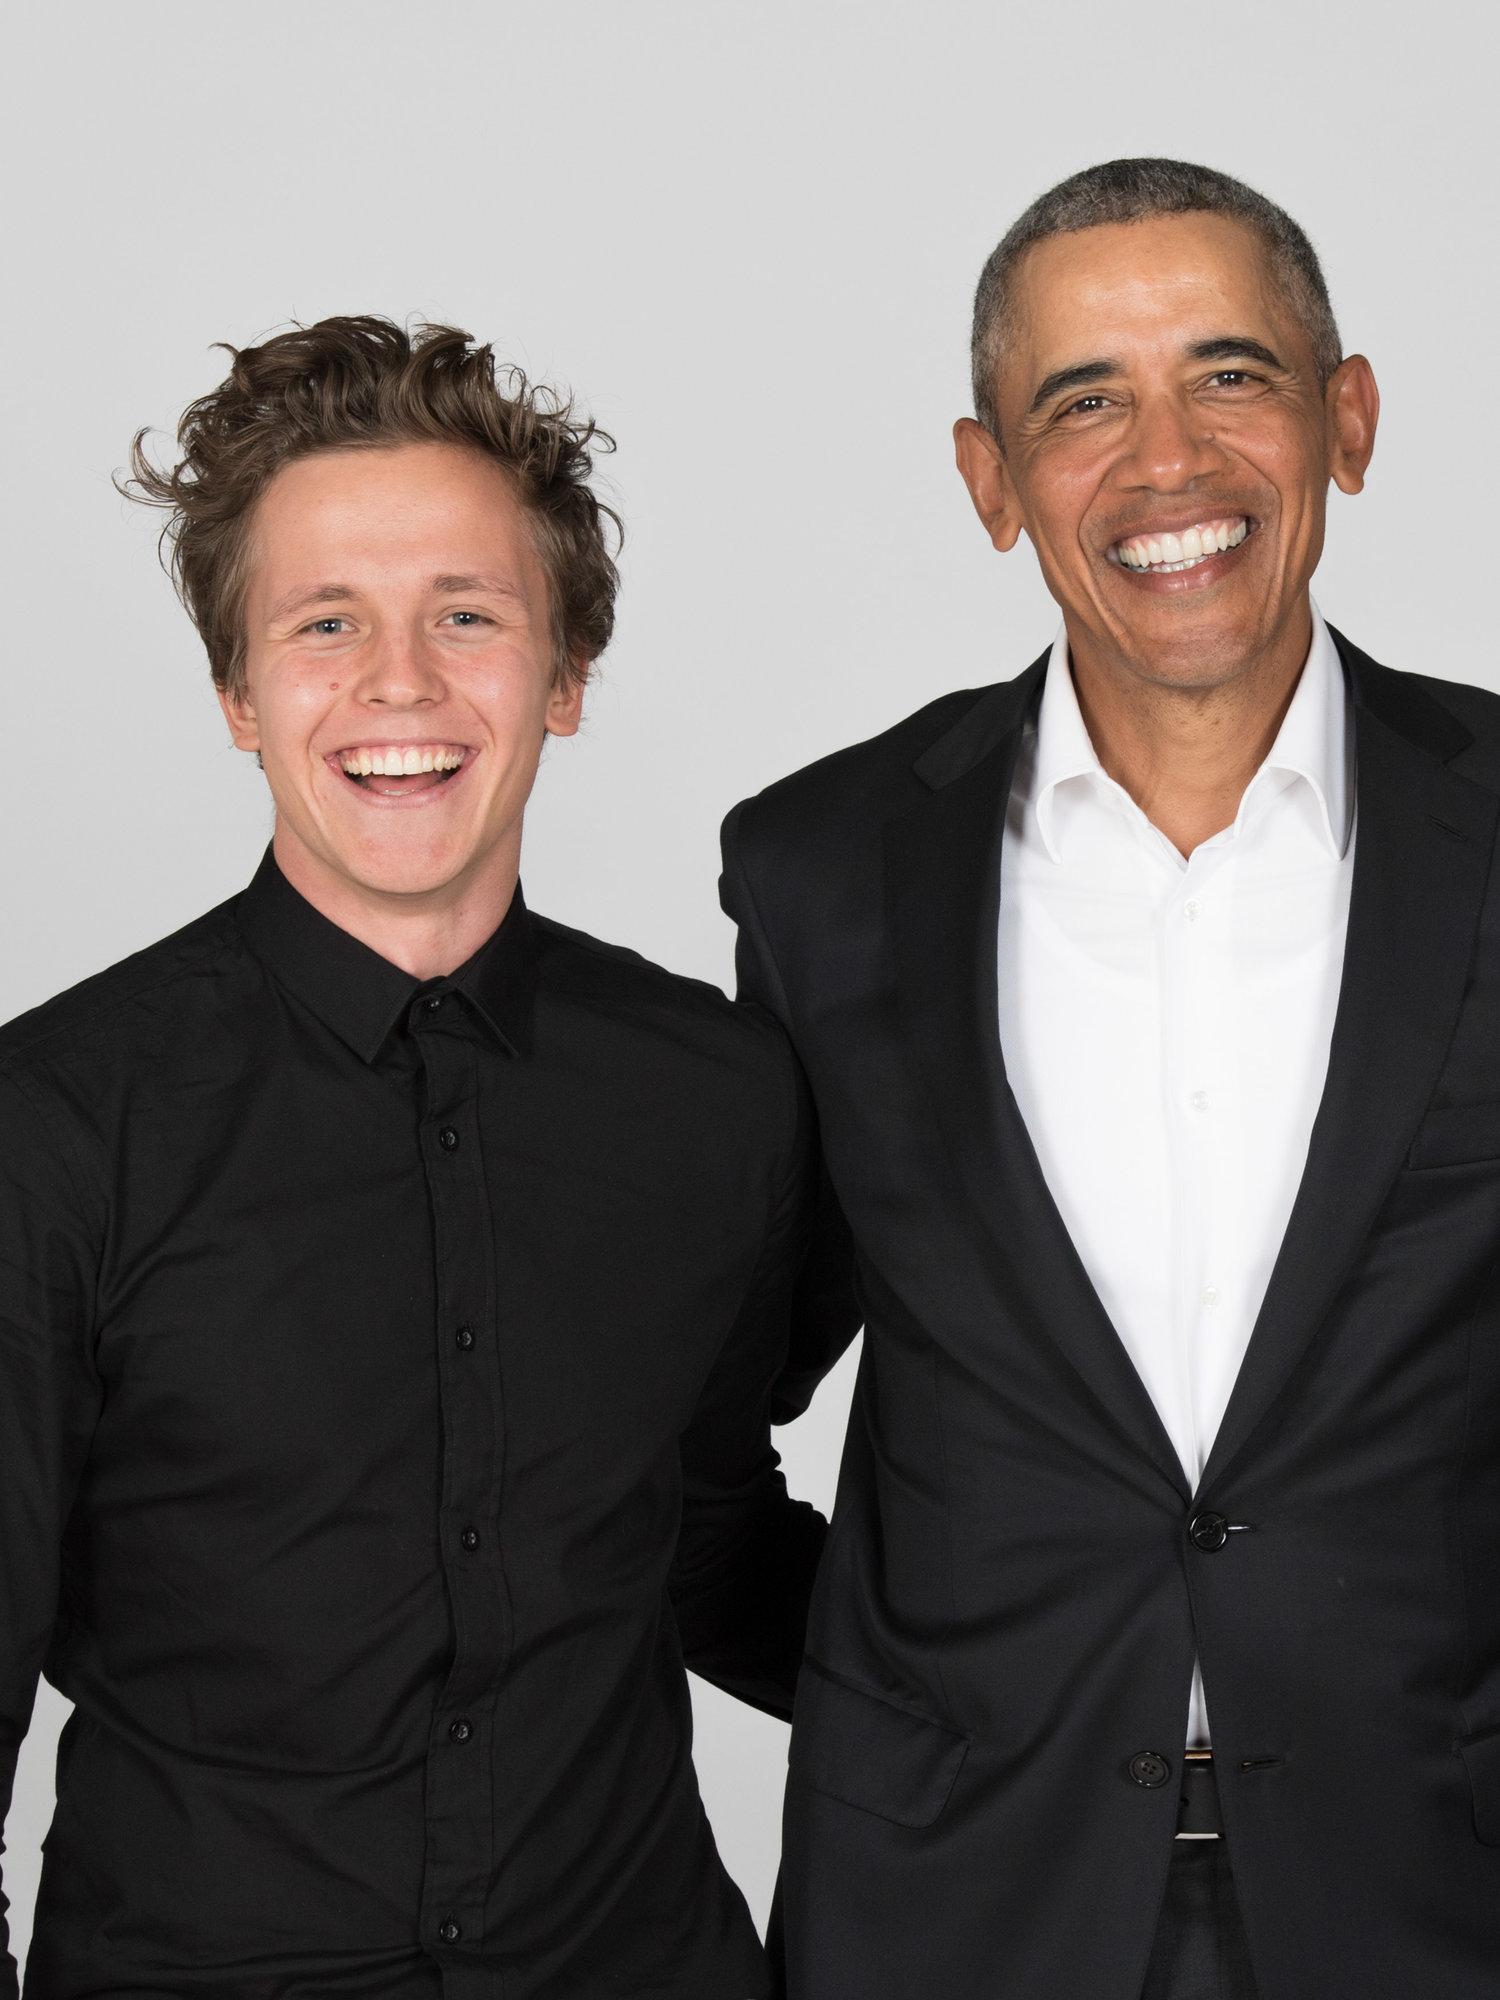 Rocket+K+and+Barak+Obama.jpeg